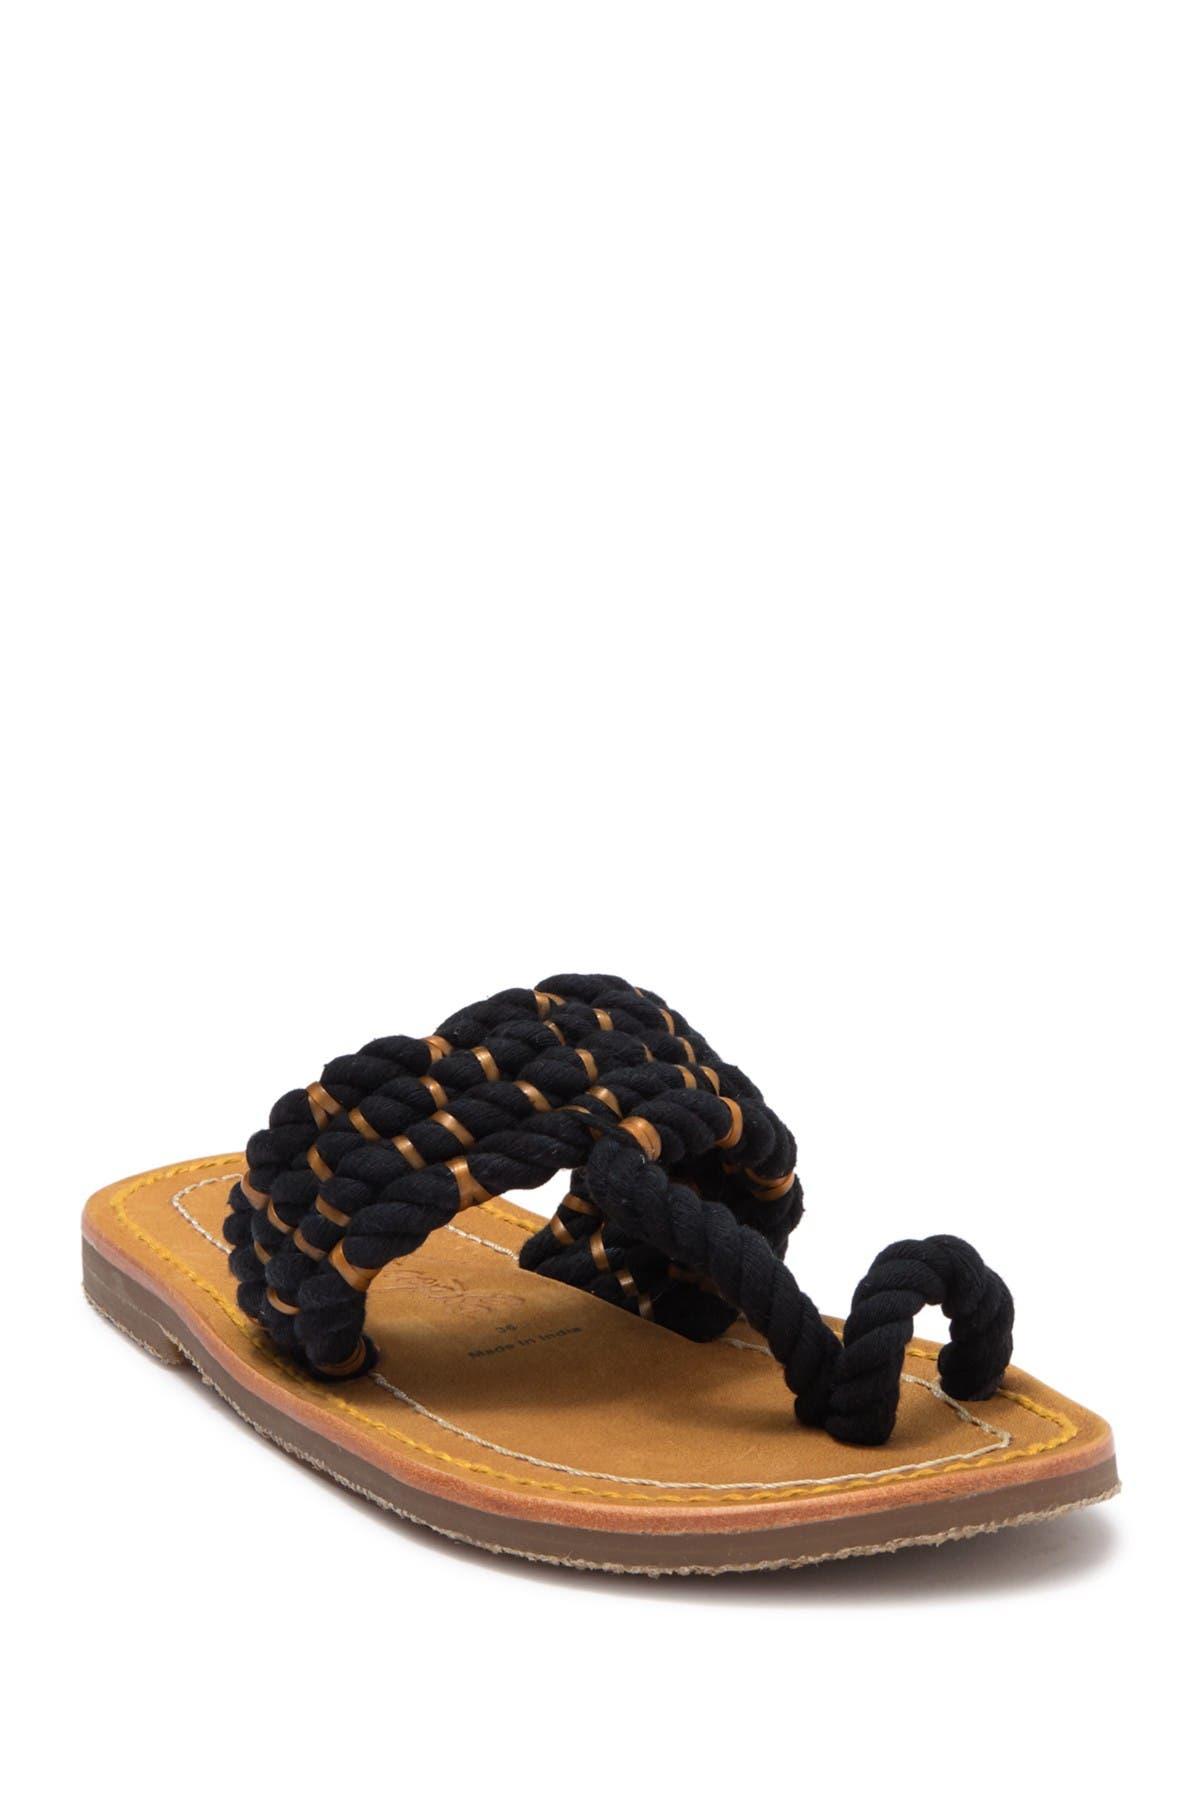 Image of Free People Libre Slip-On Sandal